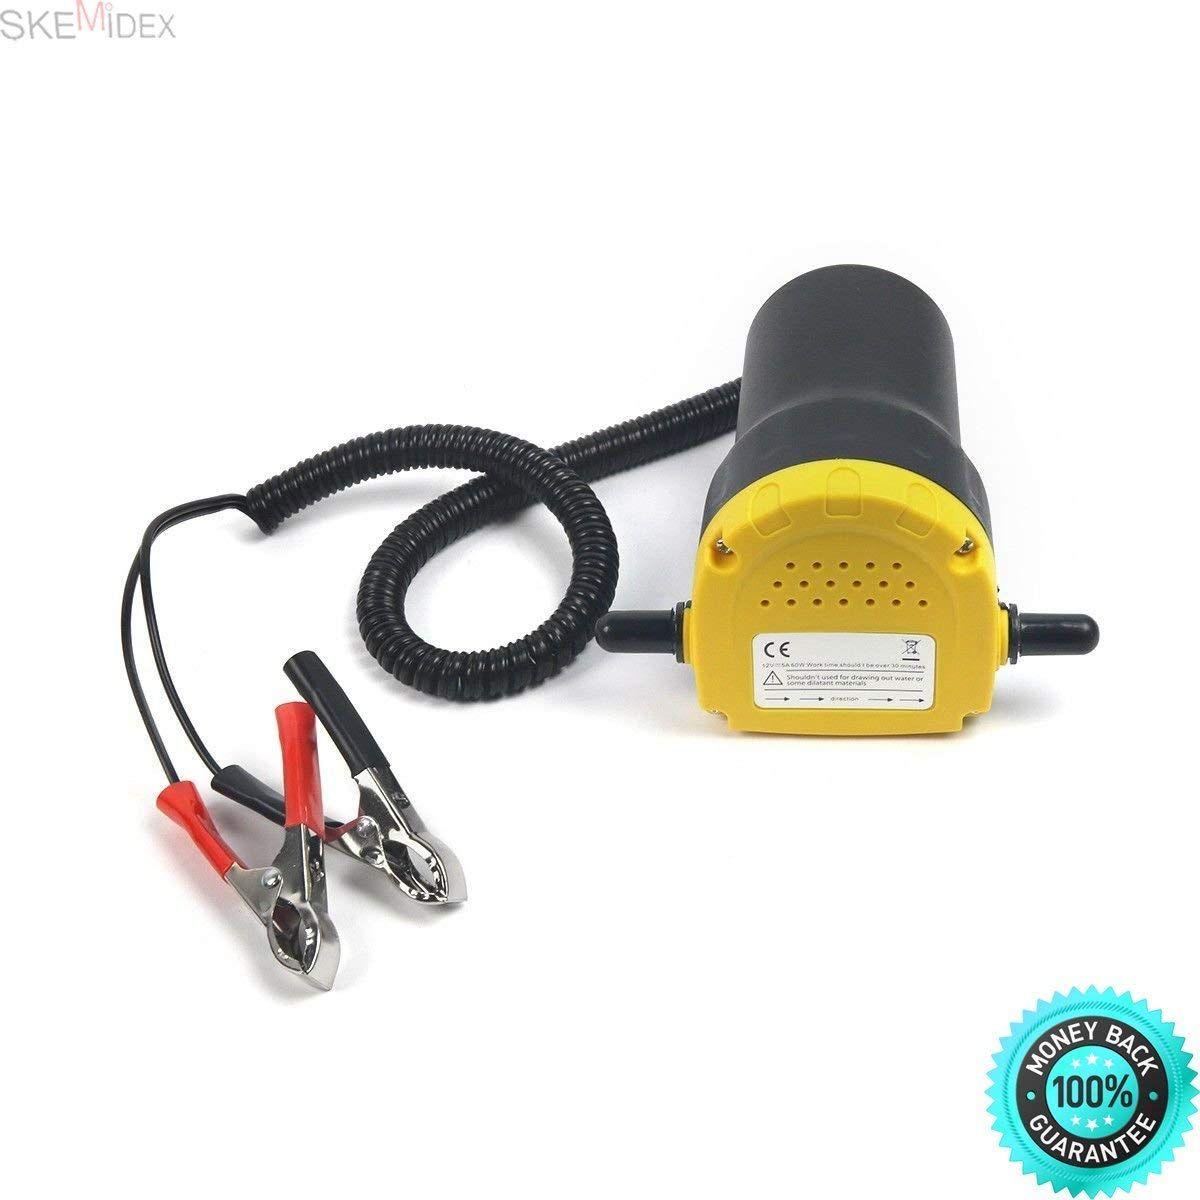 SHURFLO BY PENTAIR Piranha Straight Port Aerator 600 Livewell Pump 12 VDC 600 GPH